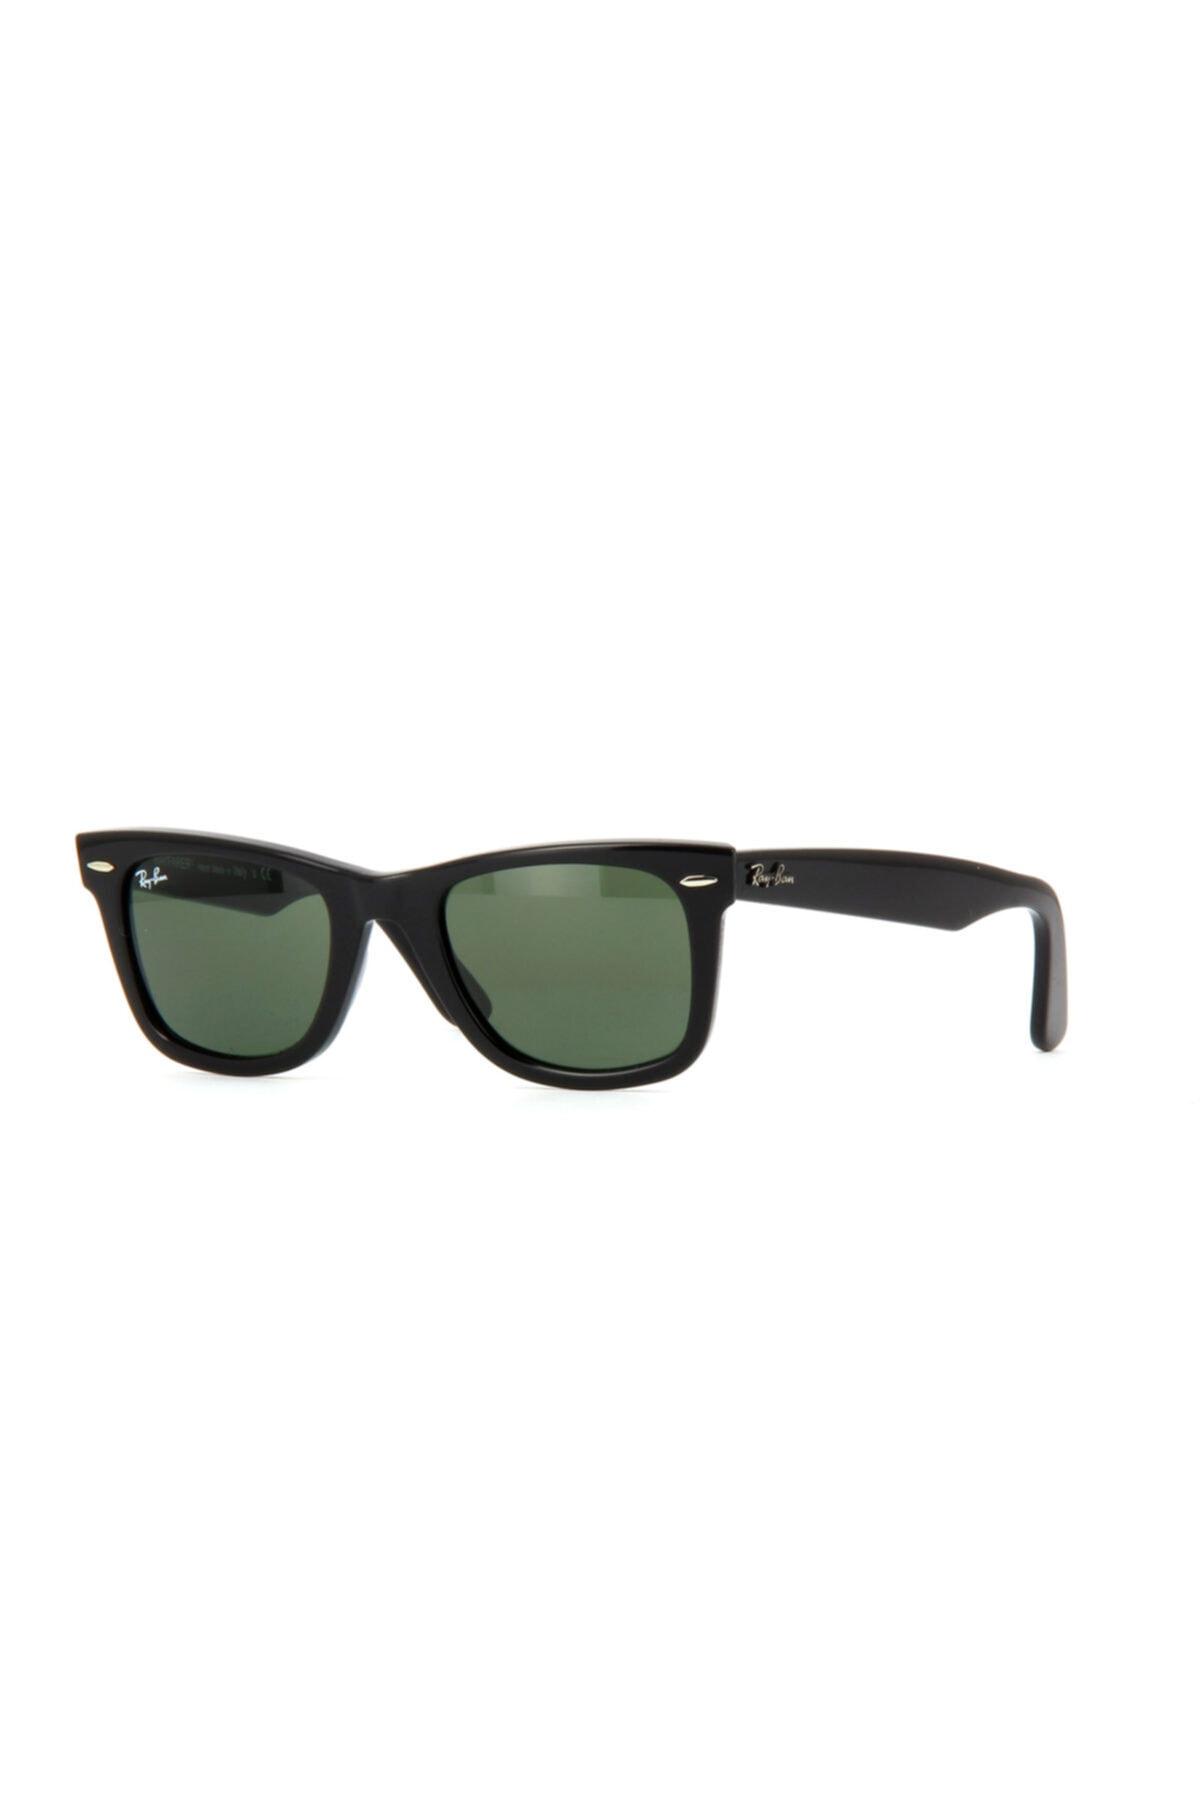 Original Rayban Women's 2021 New Season Sunglasses 901-50